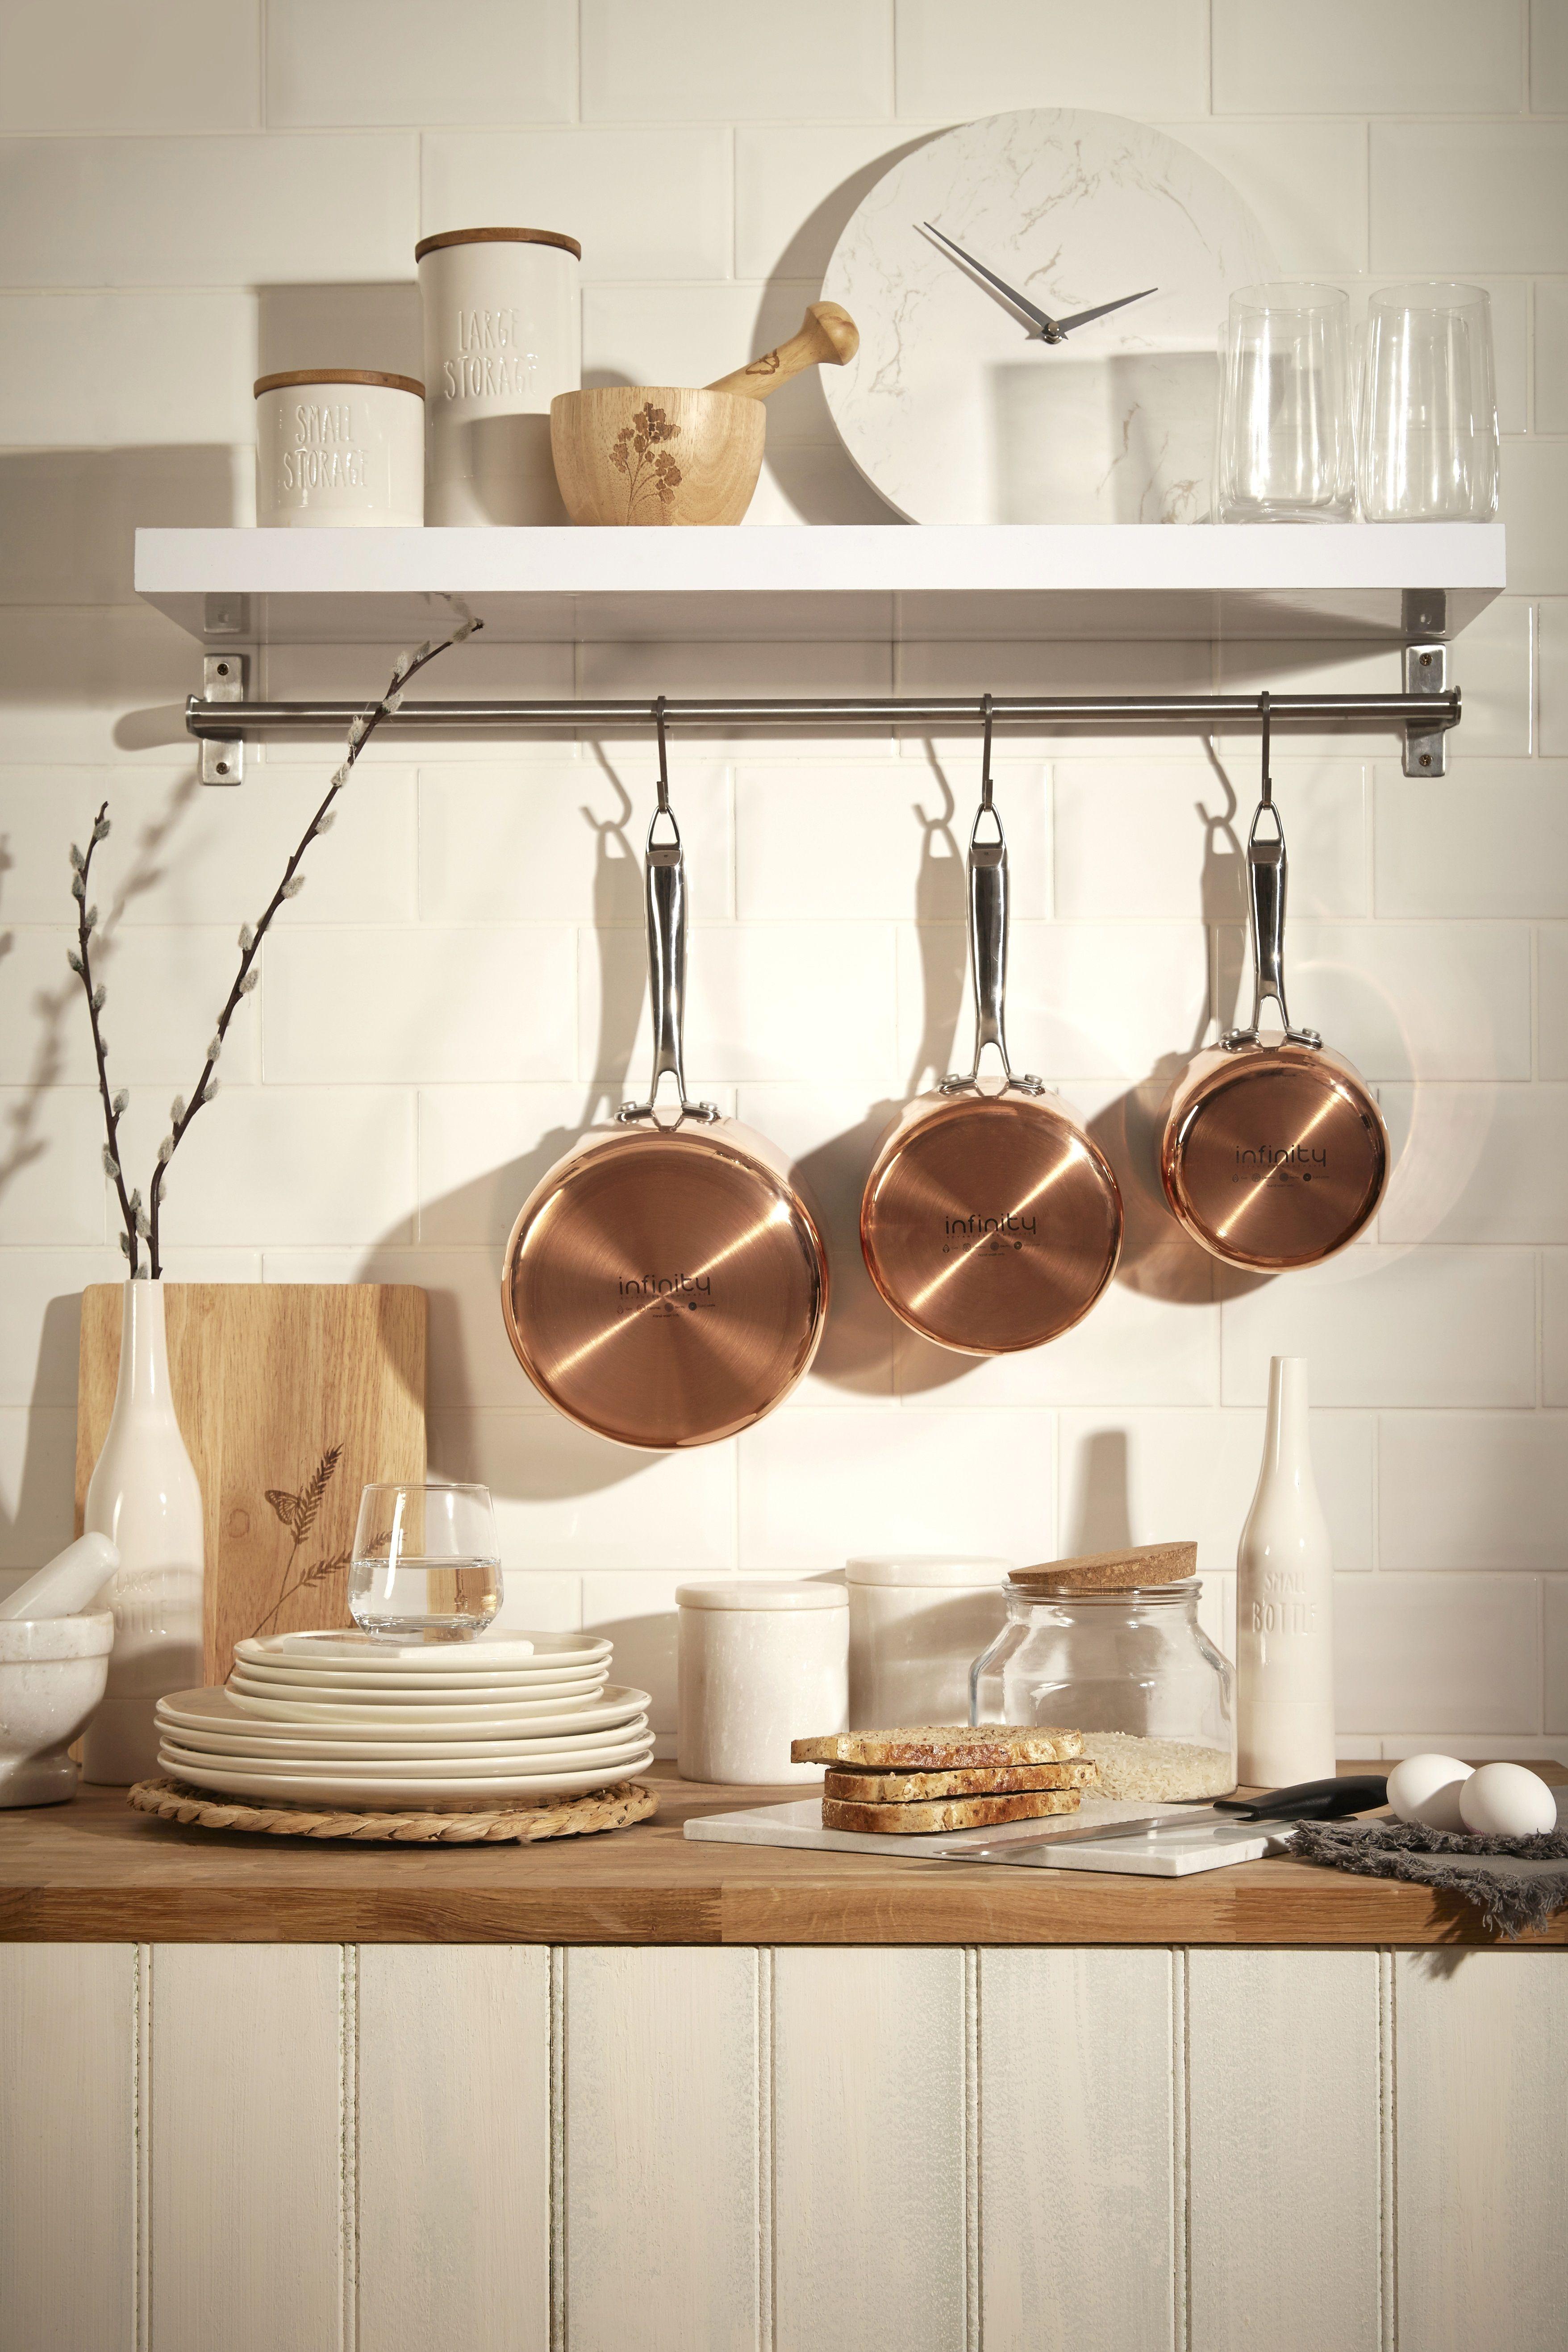 Home interiors - copper accents